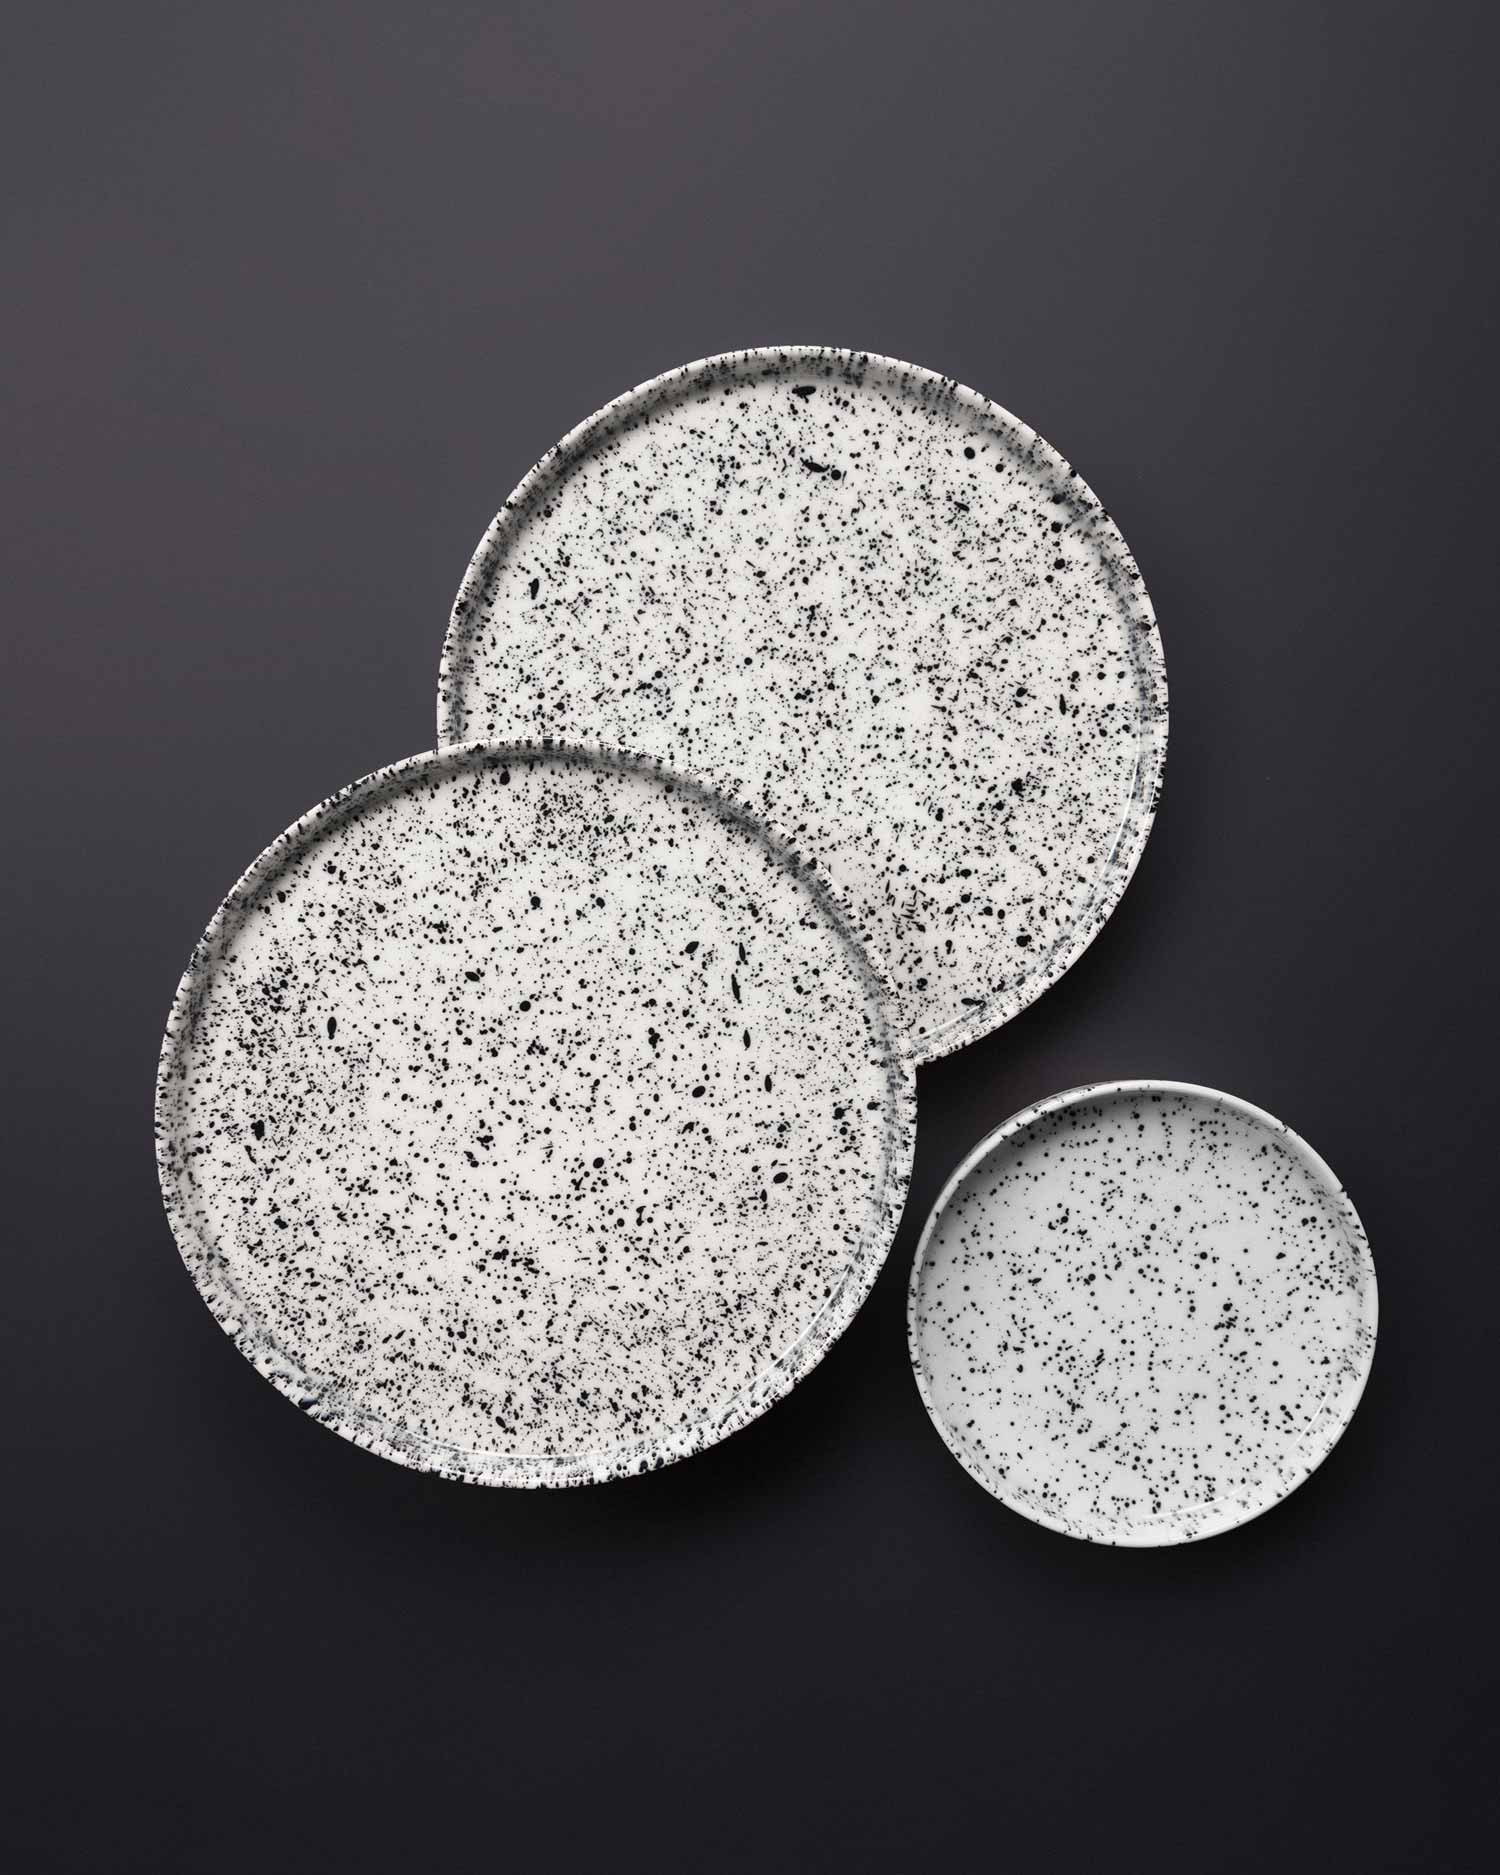 nebolusa-plates-1.jpg